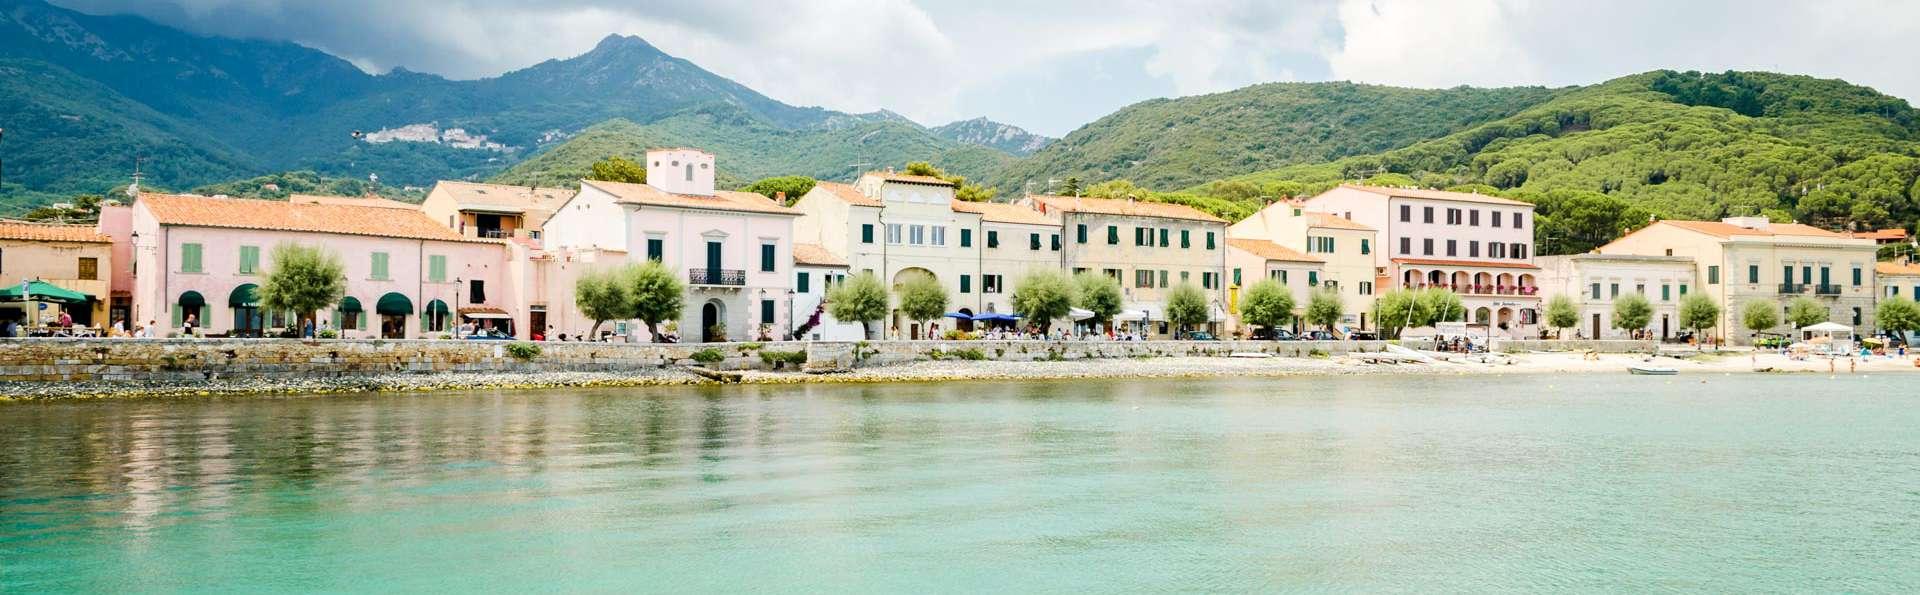 Hotel Villa dei Gerani - EDIT_DESTINATION_04.jpg